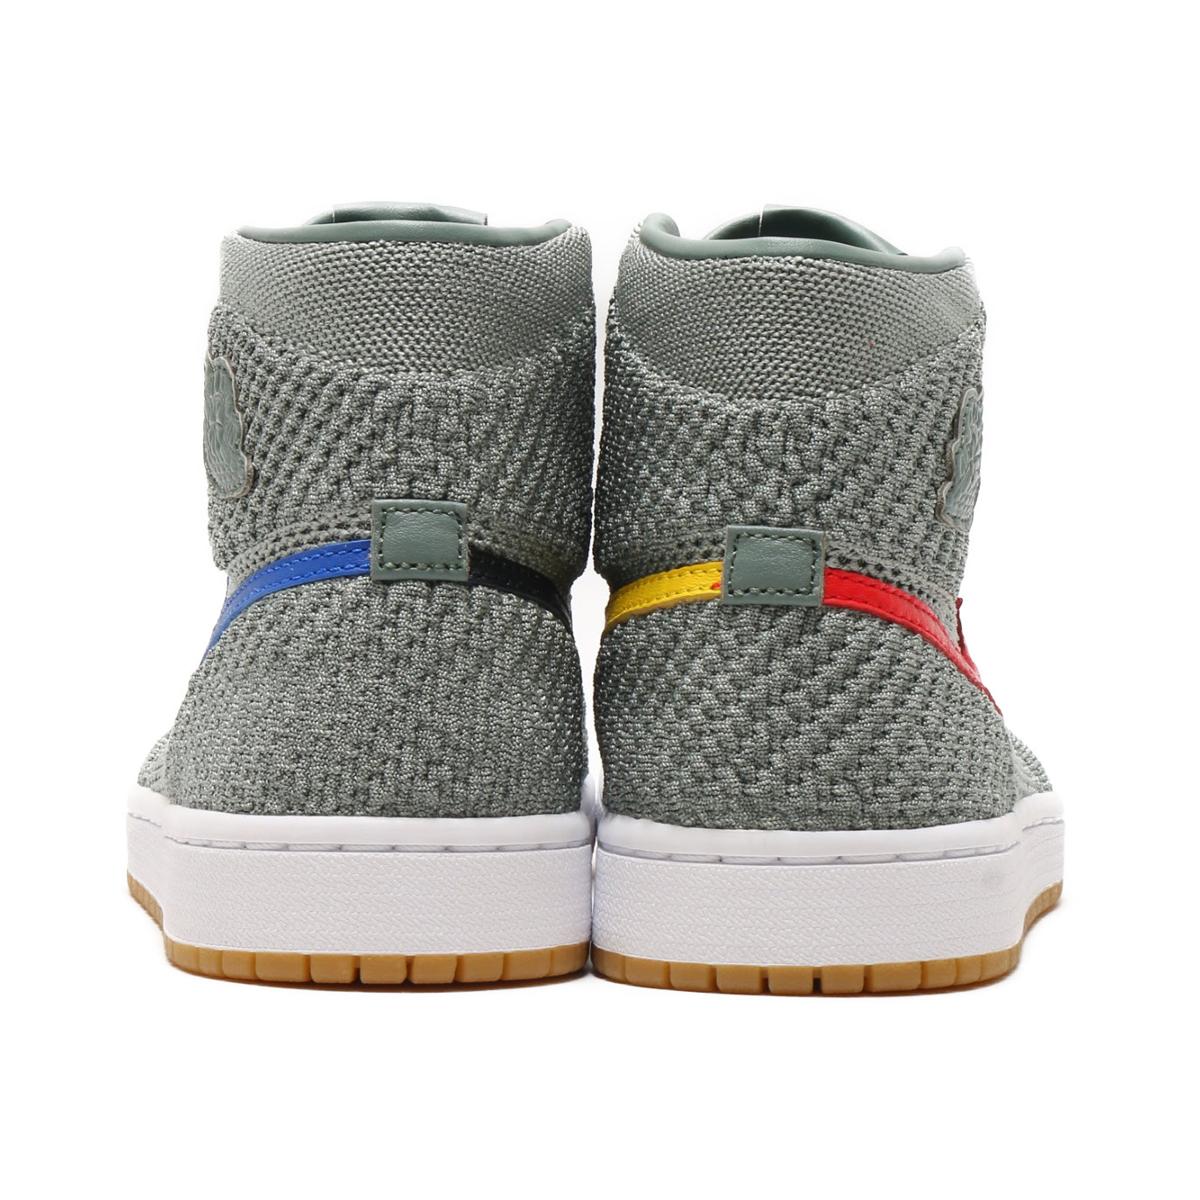 e7af8c72e76 NIKE AIR JORDAN 1 RET HI FLYKNIT BG (Nike Air Jordan 1 nostalgic high fried  food knit BG) (CLAY GREEN WHITE-HYPER COBALT-GUM YELLOW) 18SU-S